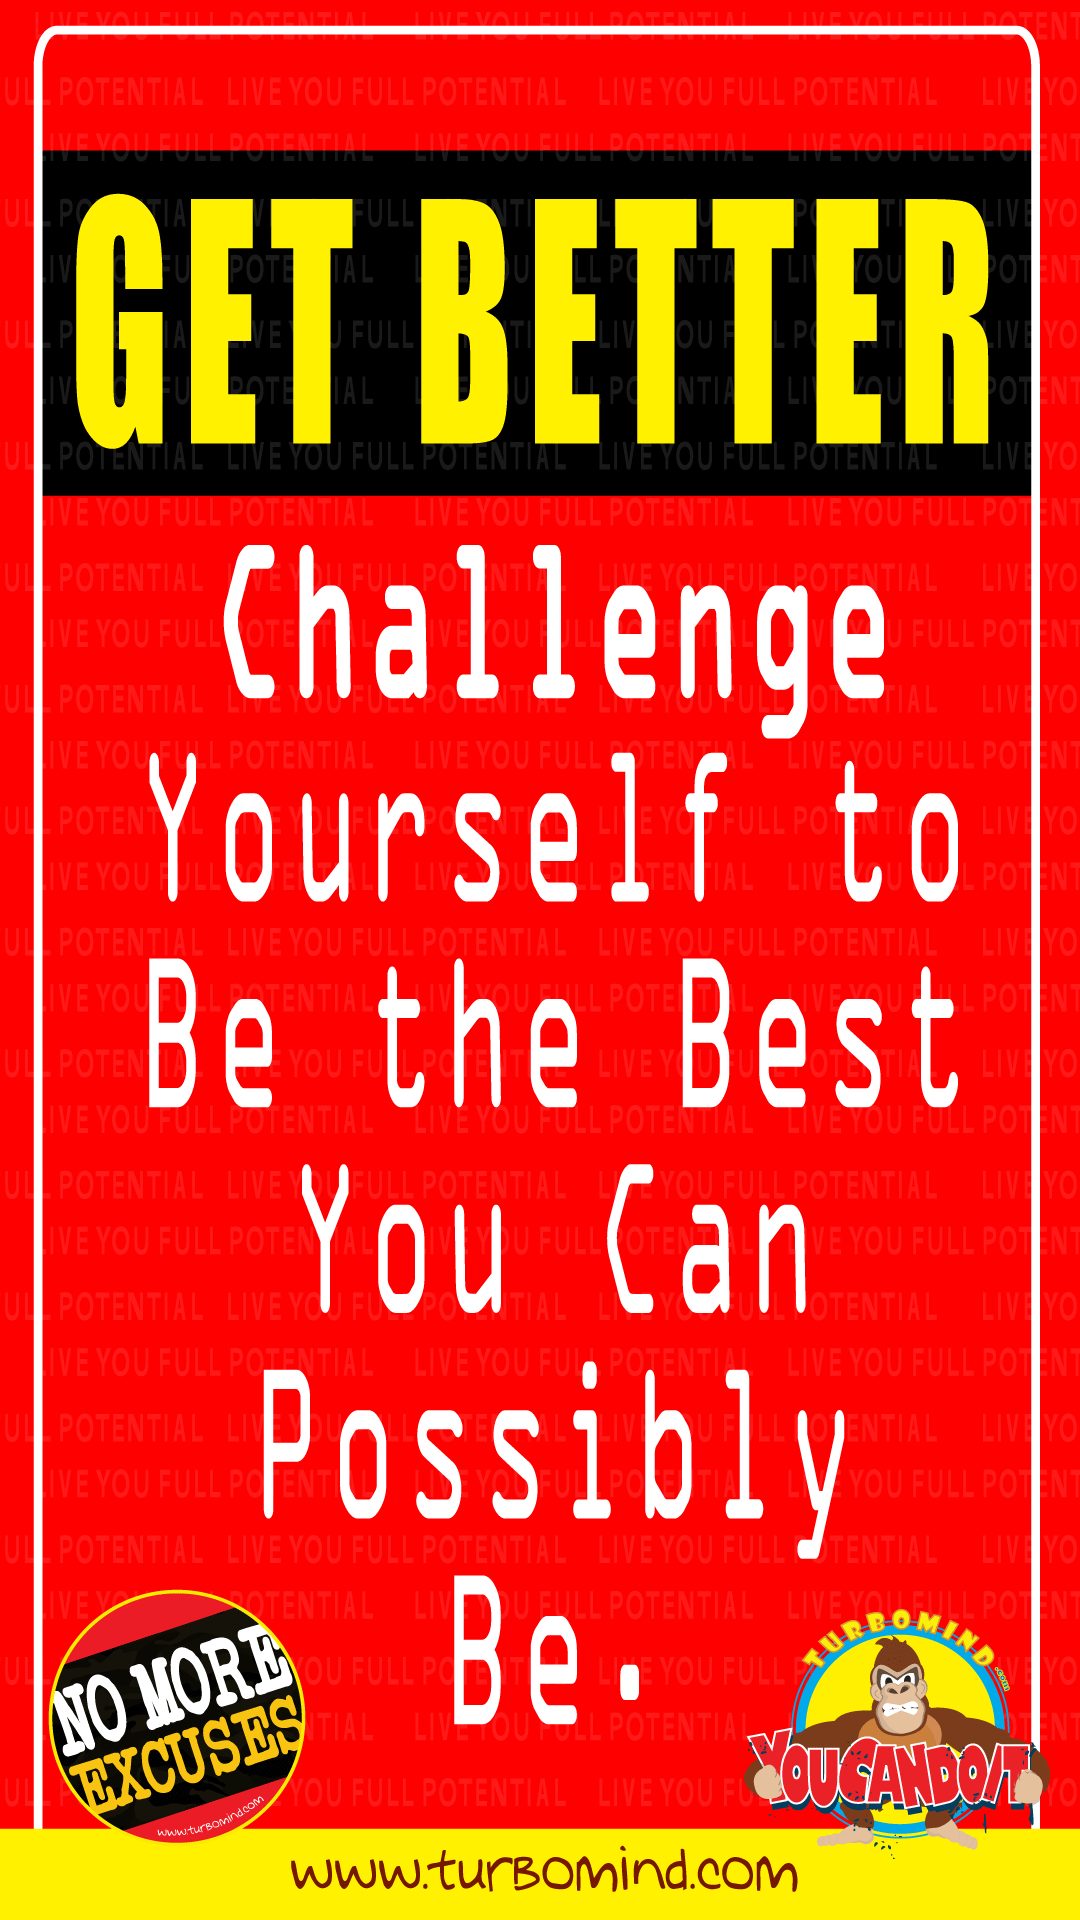 GET BETTER, CHALLENGE YOURSELF